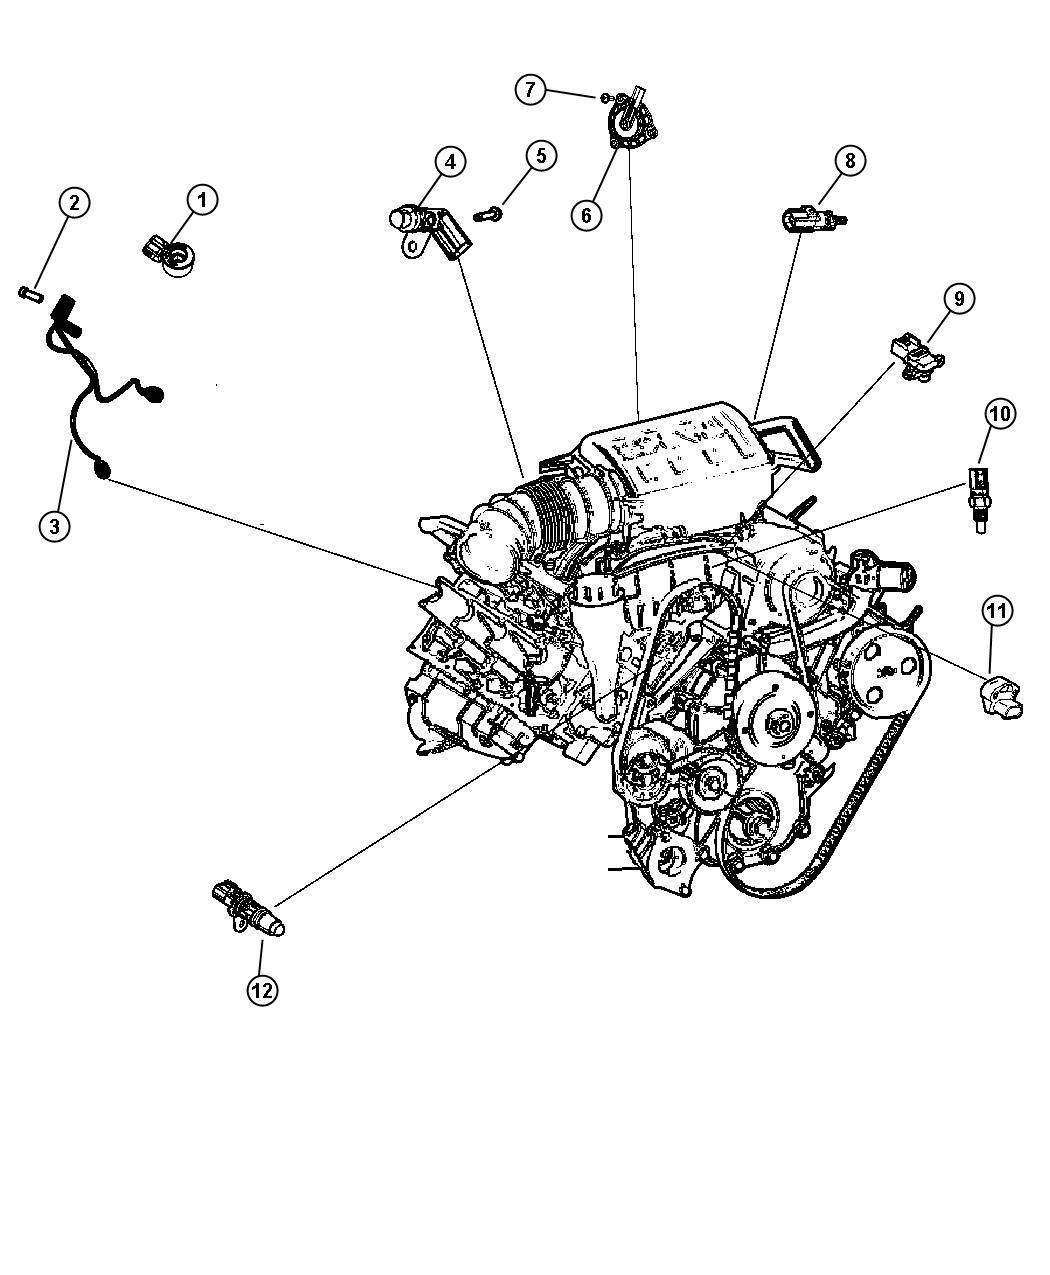 Chrysler Town & Country Sensor. Crankshaft position